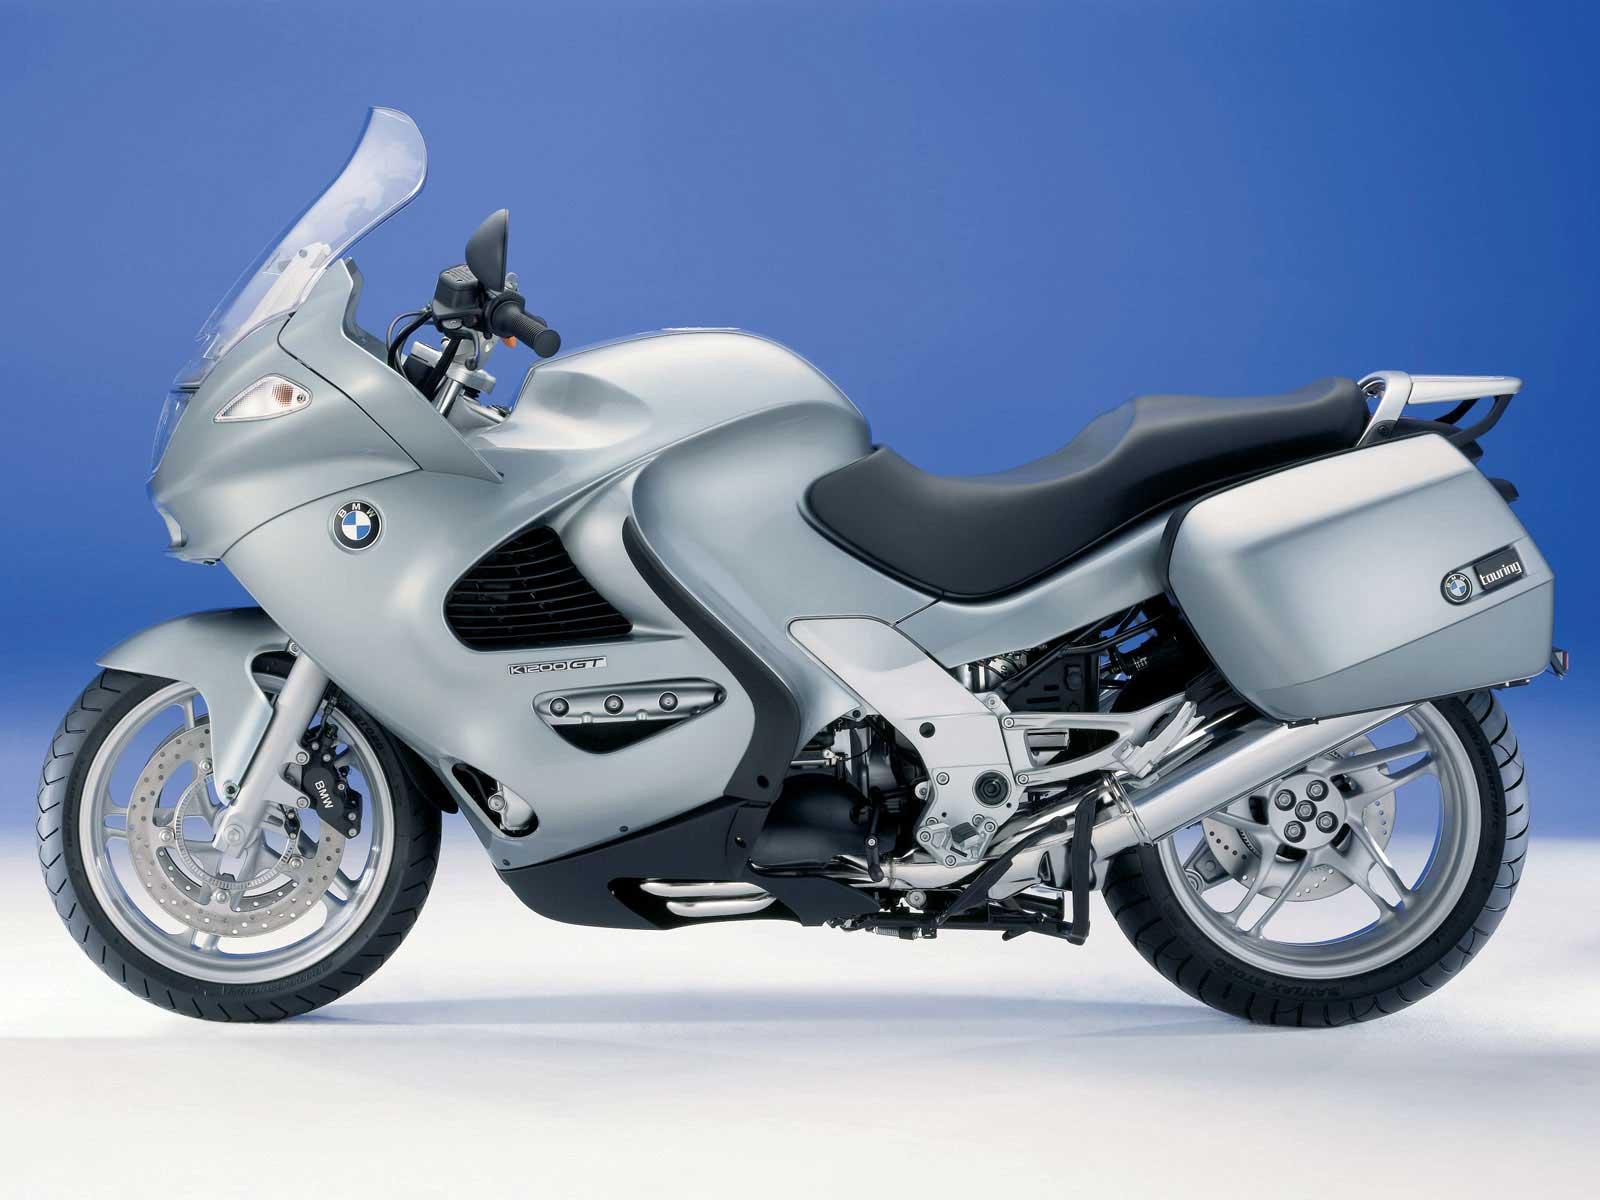 2002 bmw k1200gt motorcycle insurance wallpapers. Black Bedroom Furniture Sets. Home Design Ideas